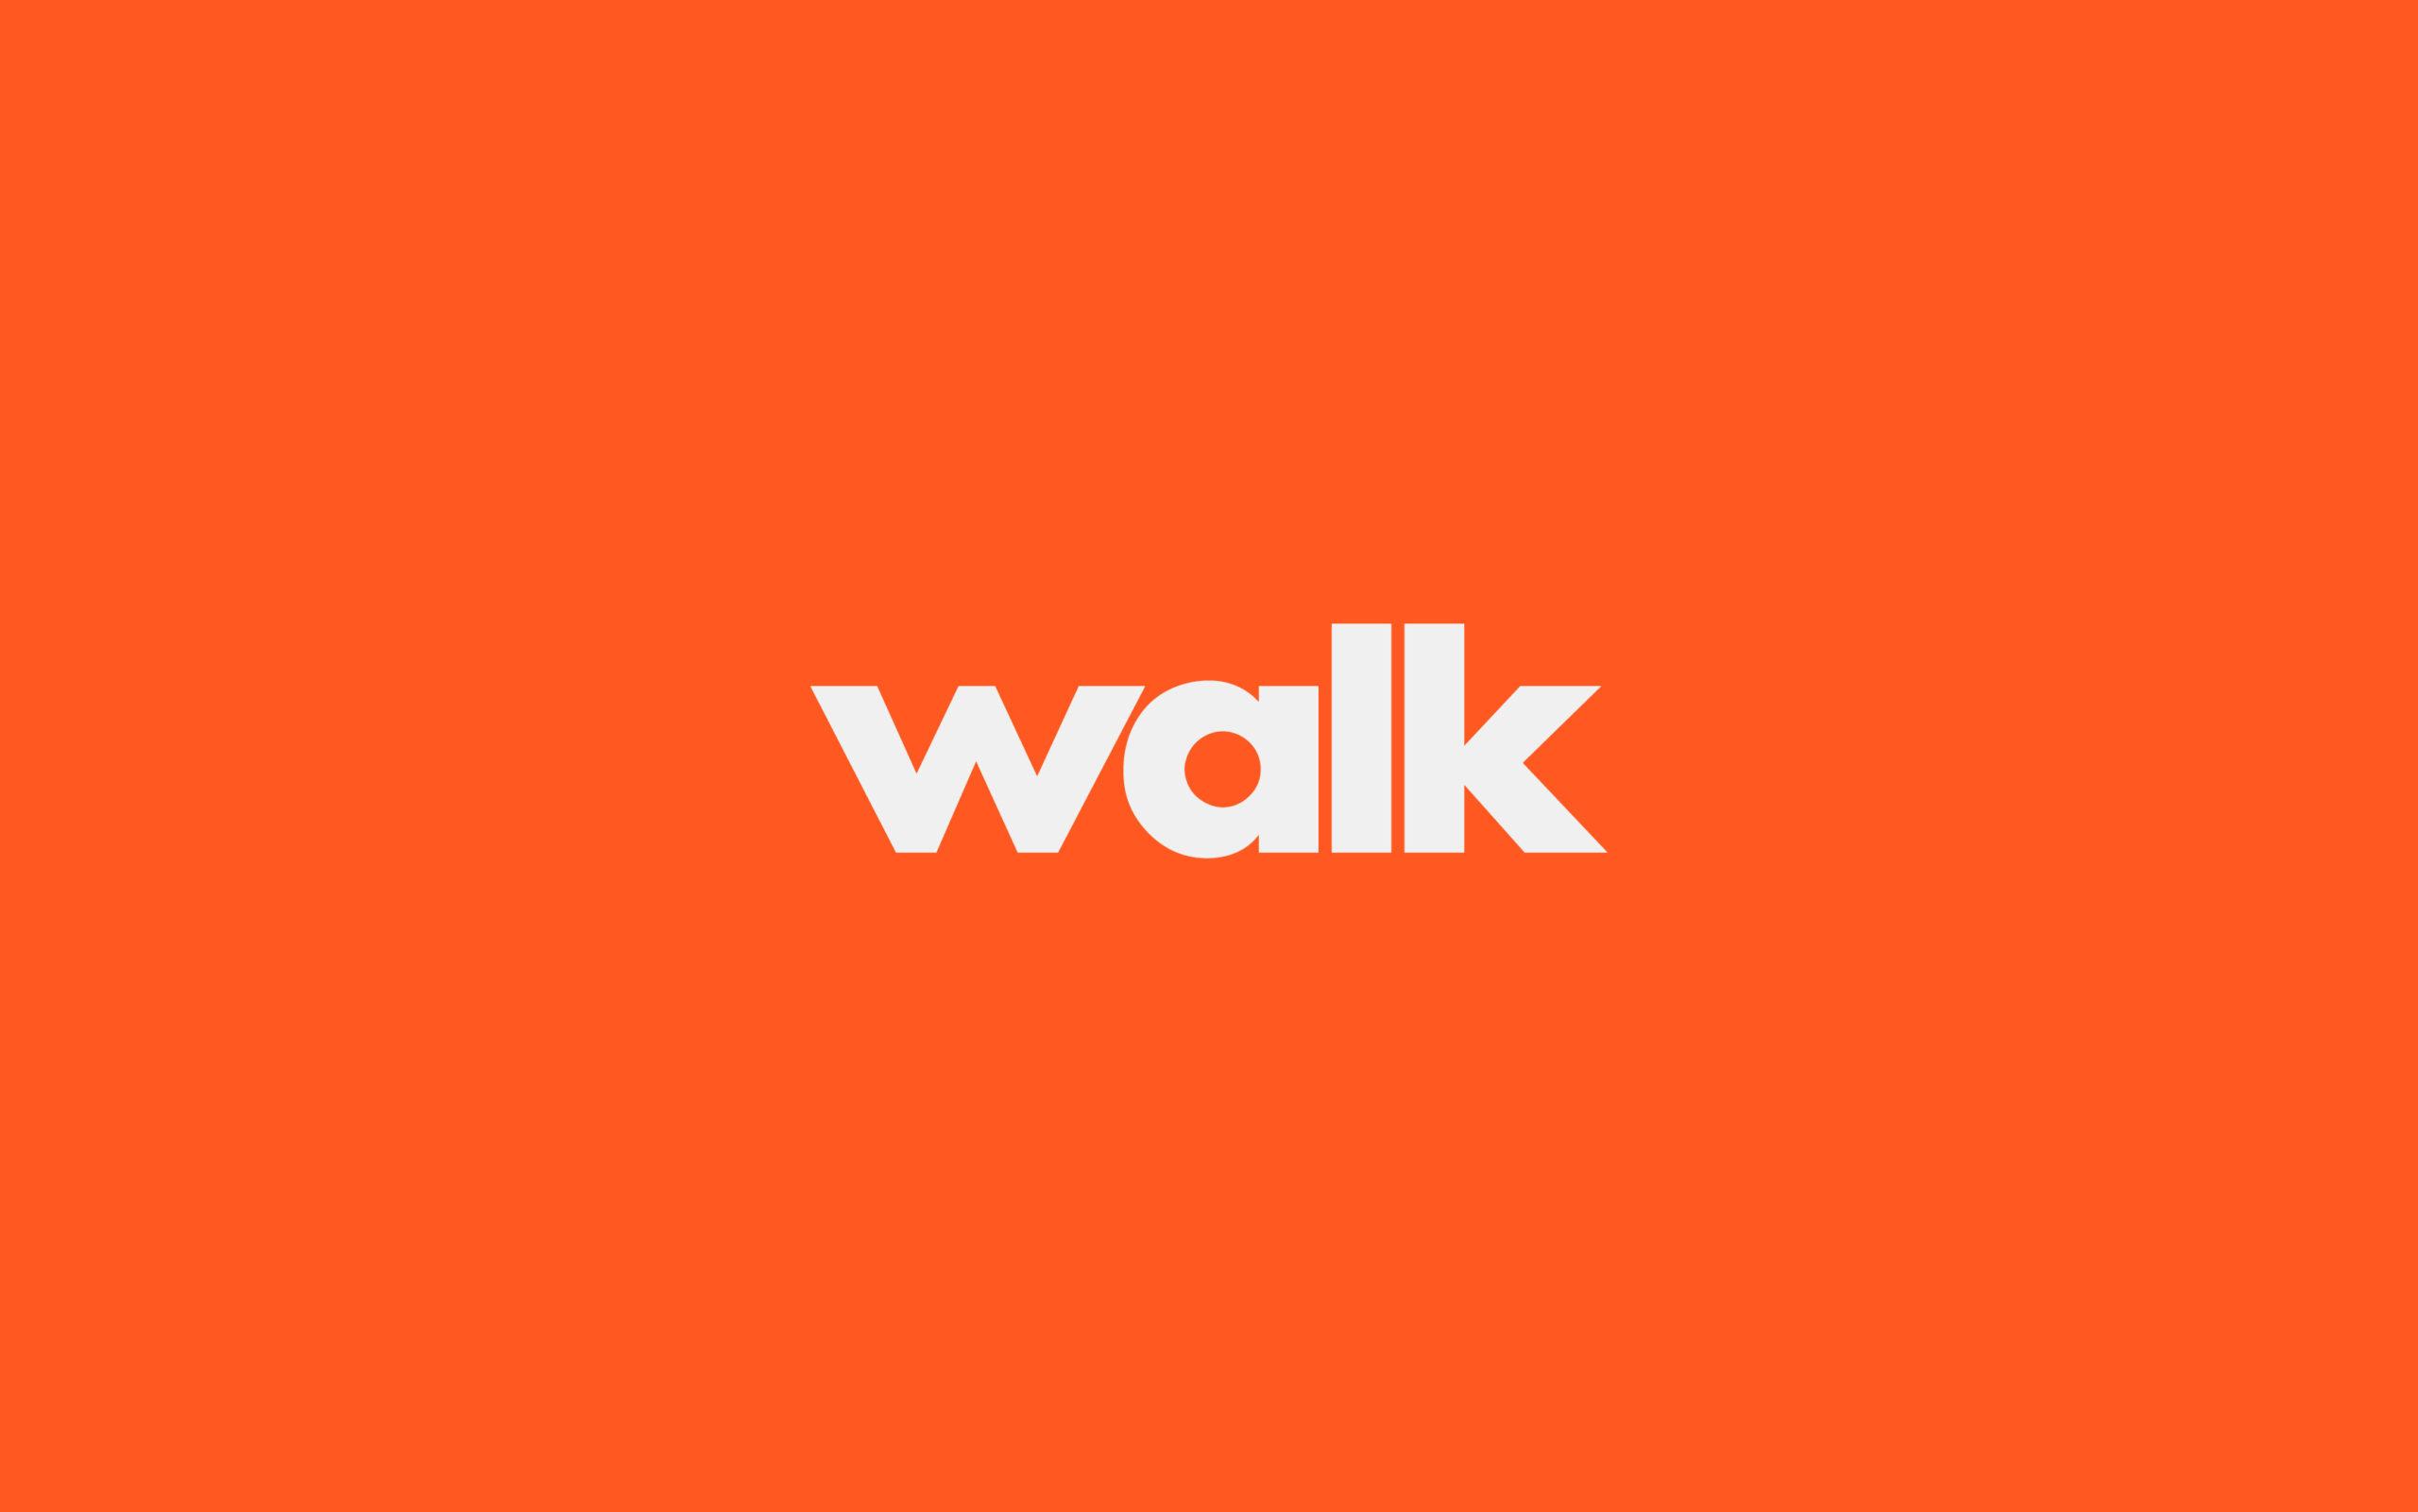 Walk-Missions-Brand-Identity-Design_1